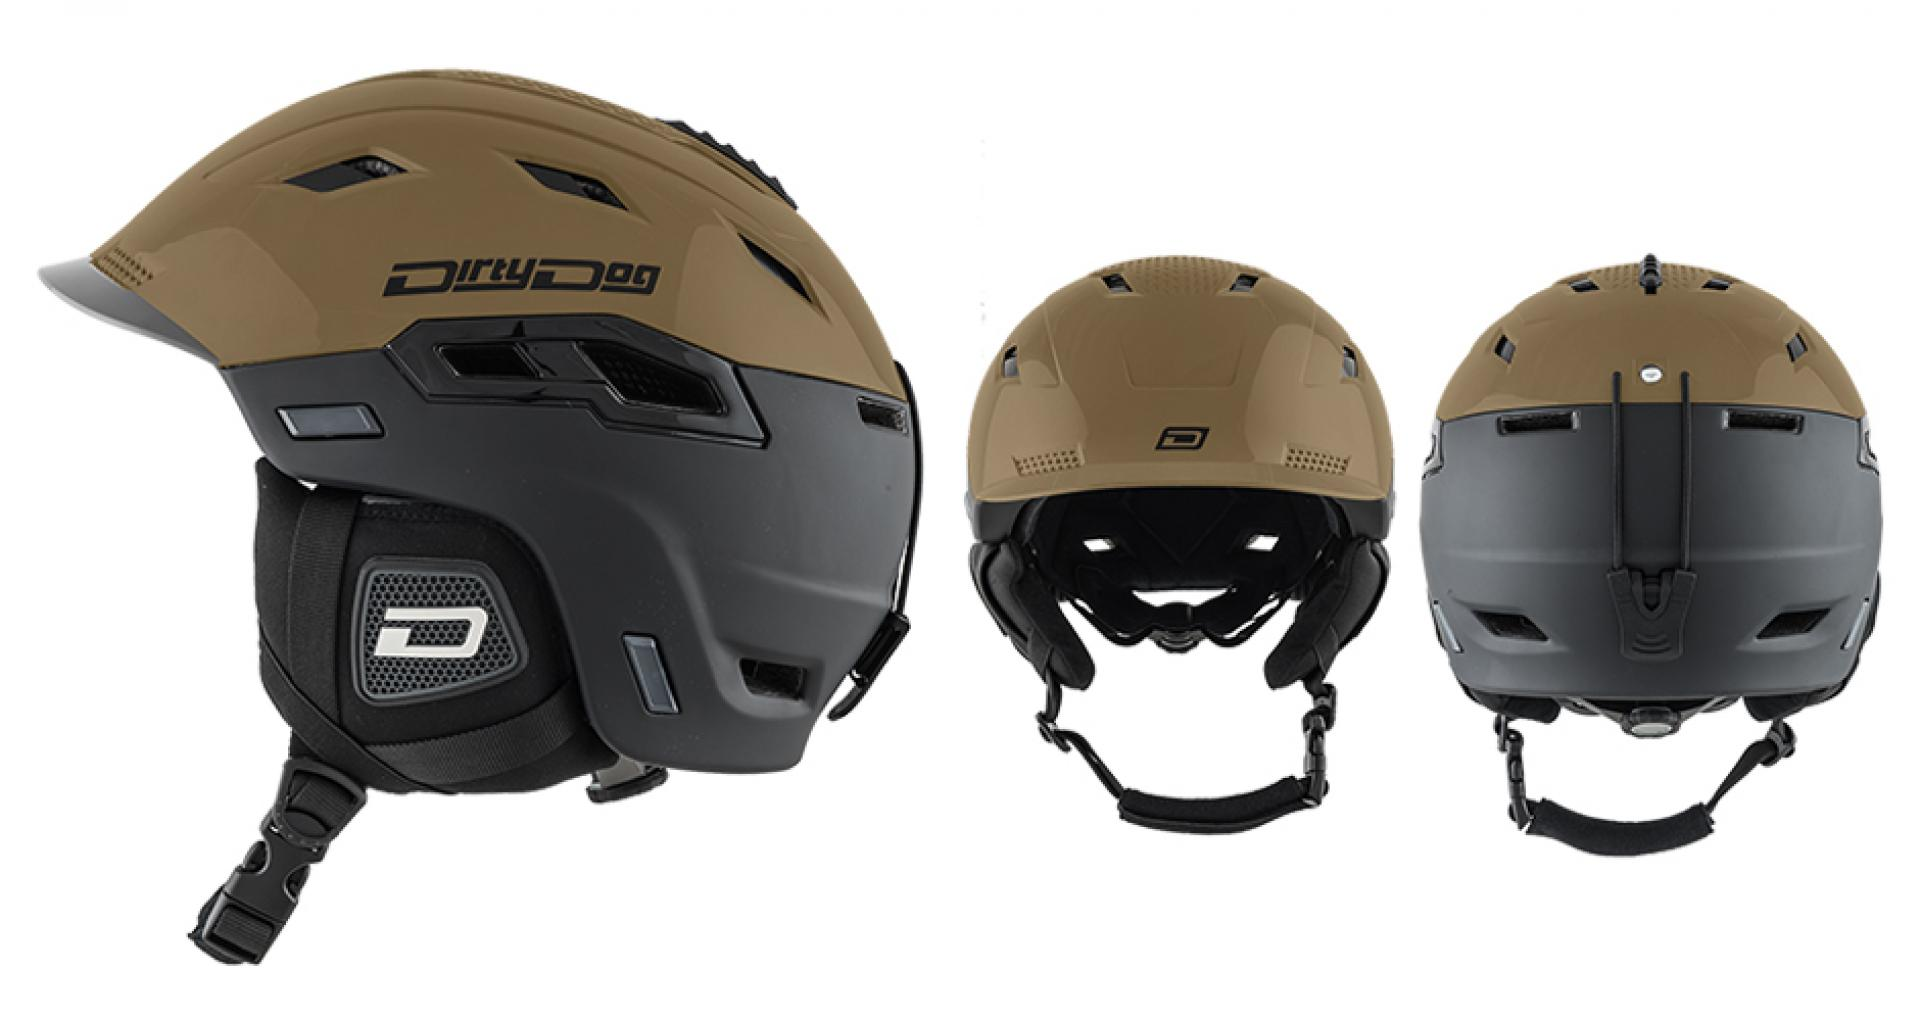 Dirty Dog Crater SnowboardSki Helmet